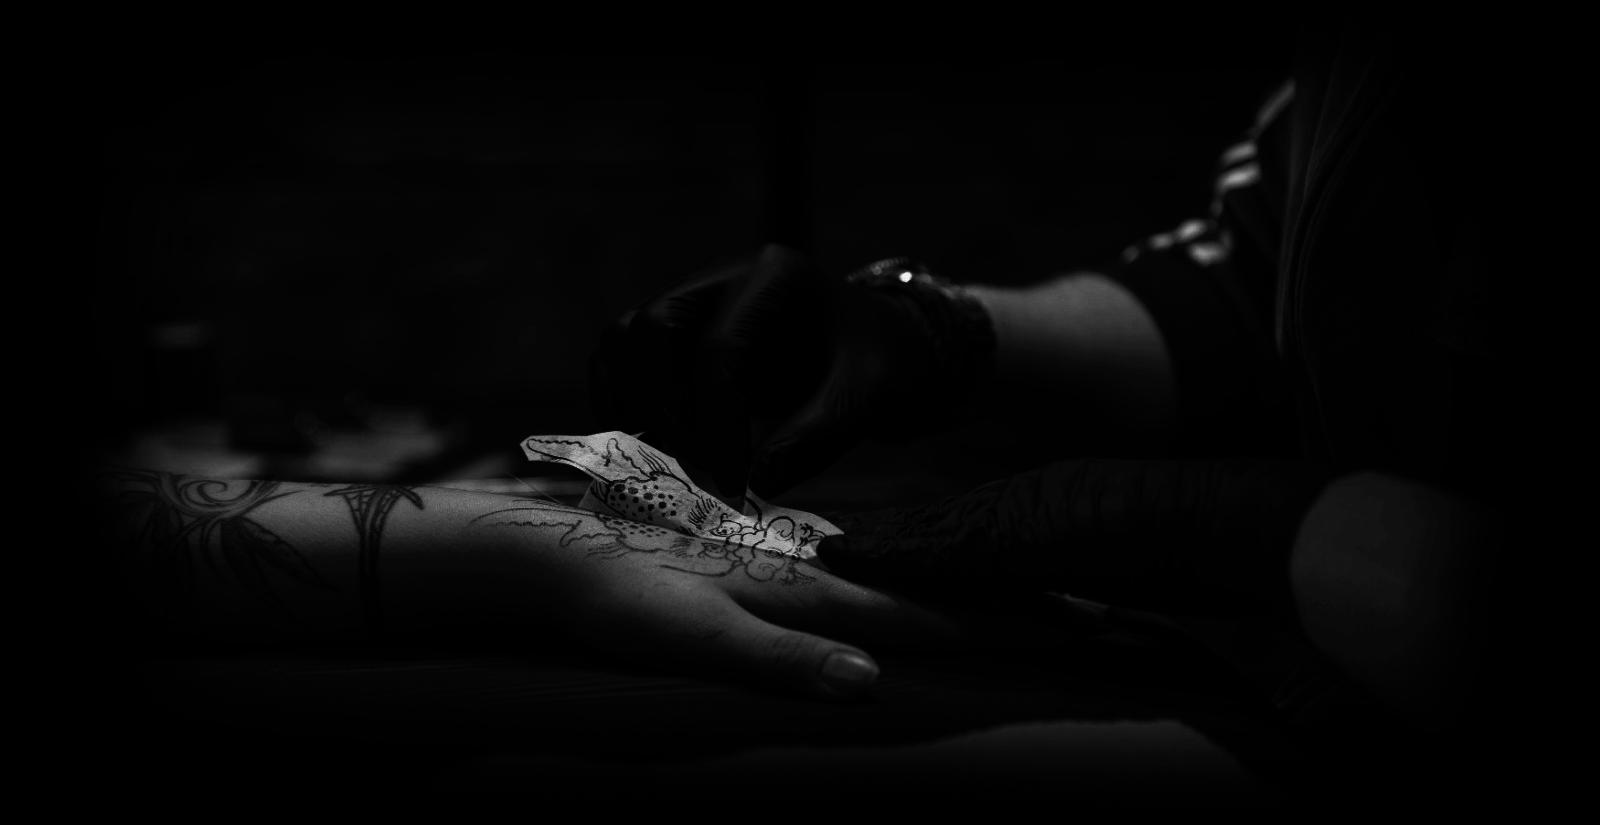 federico-novelli-tattooer-restyling-di-un-tatuaggio